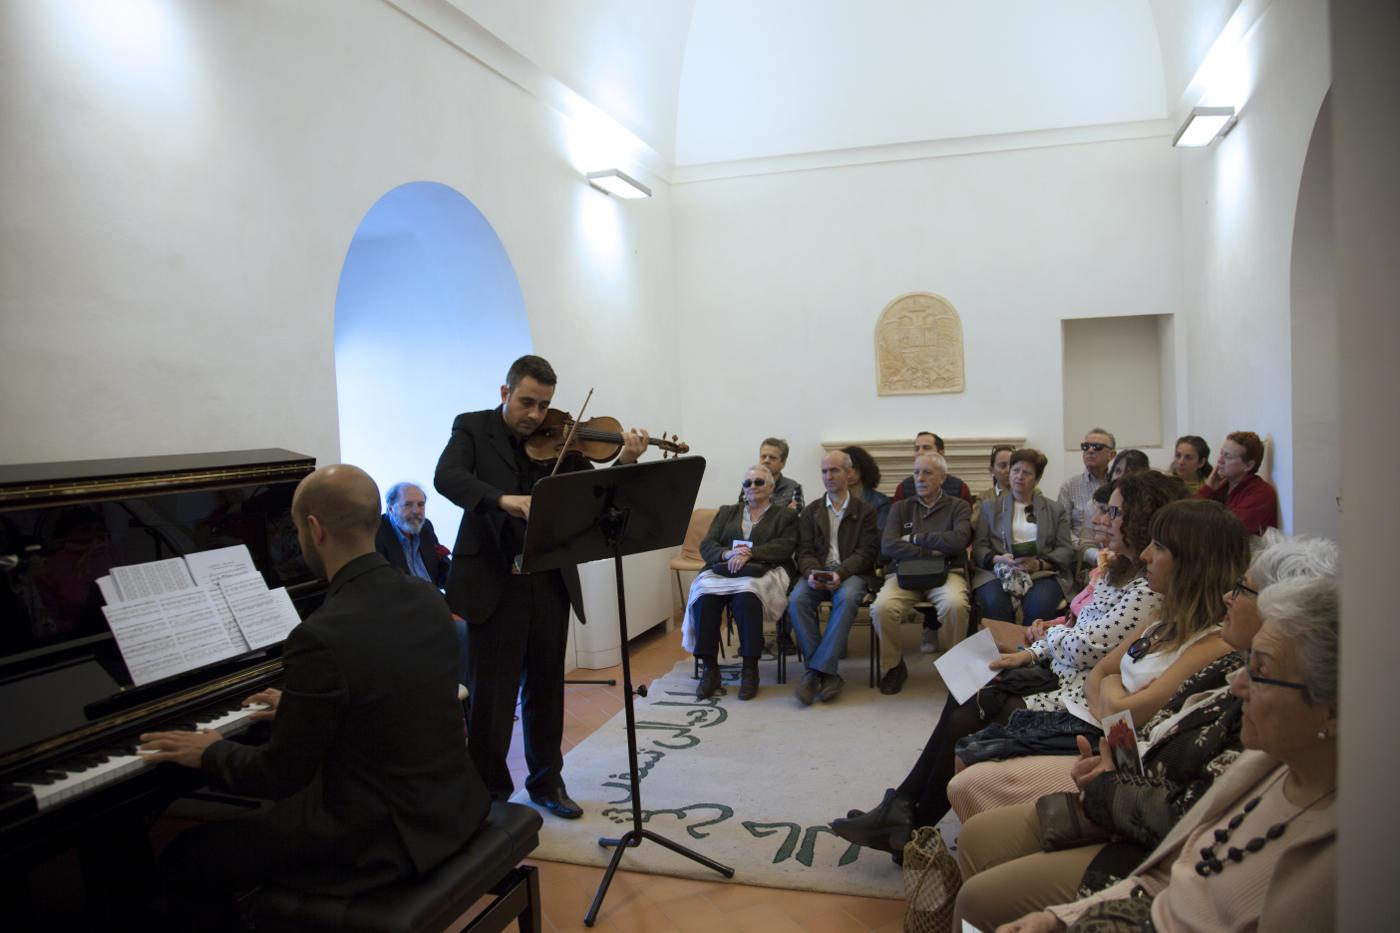 Sonidos de la Palabra - Álvaro Izquierdo, Jorge Gijón, Fernando de Villena